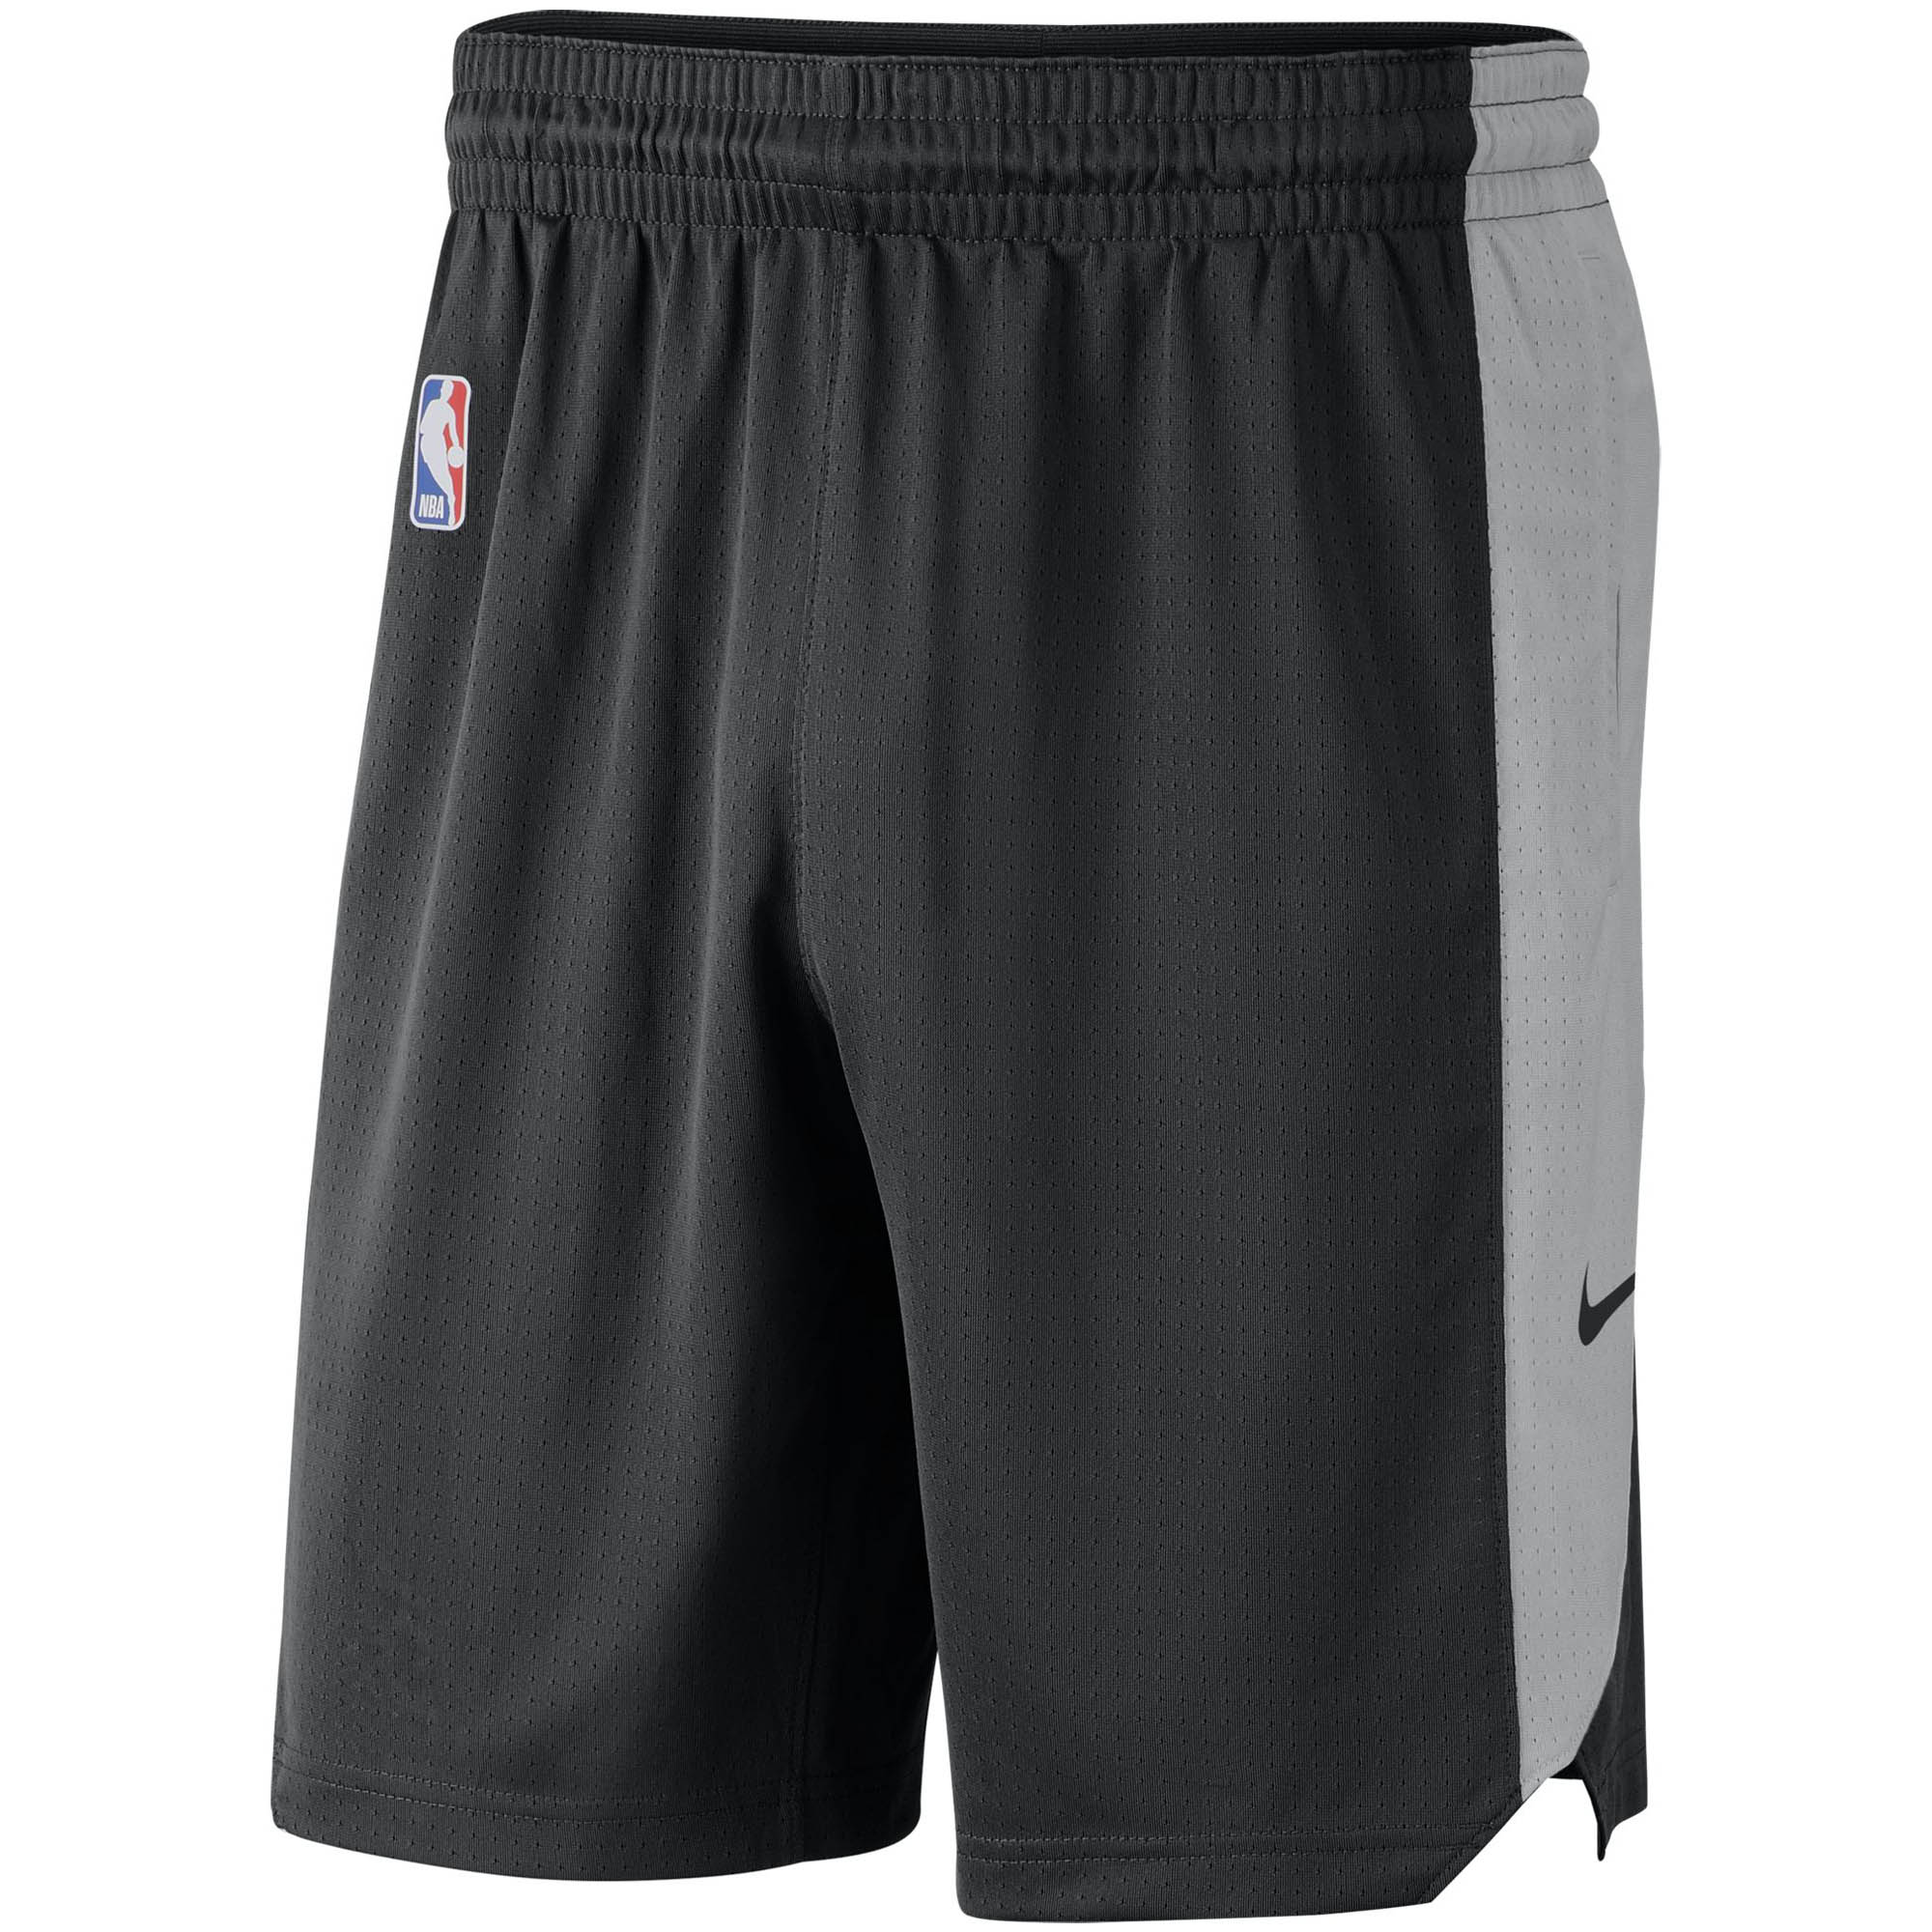 San Antonio Spurs Nike Performance Practice Shorts - Black